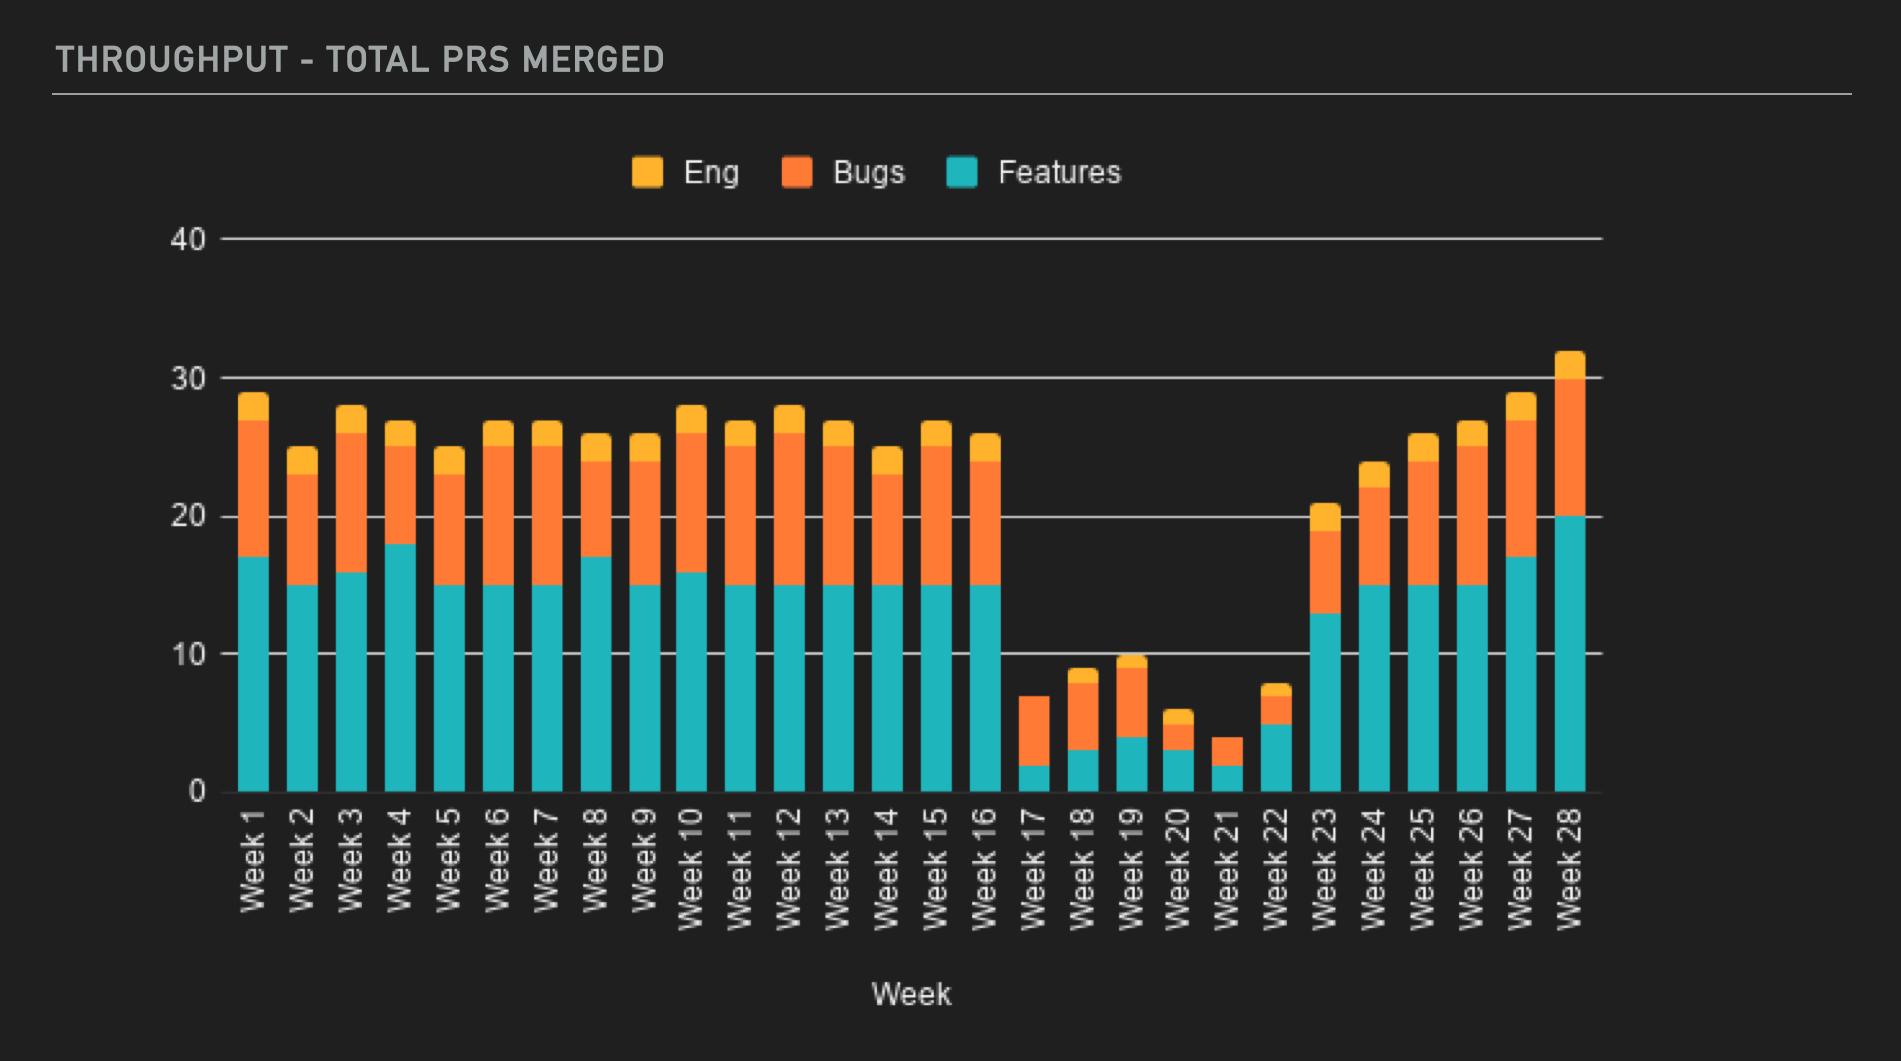 throughput total prs merged chart